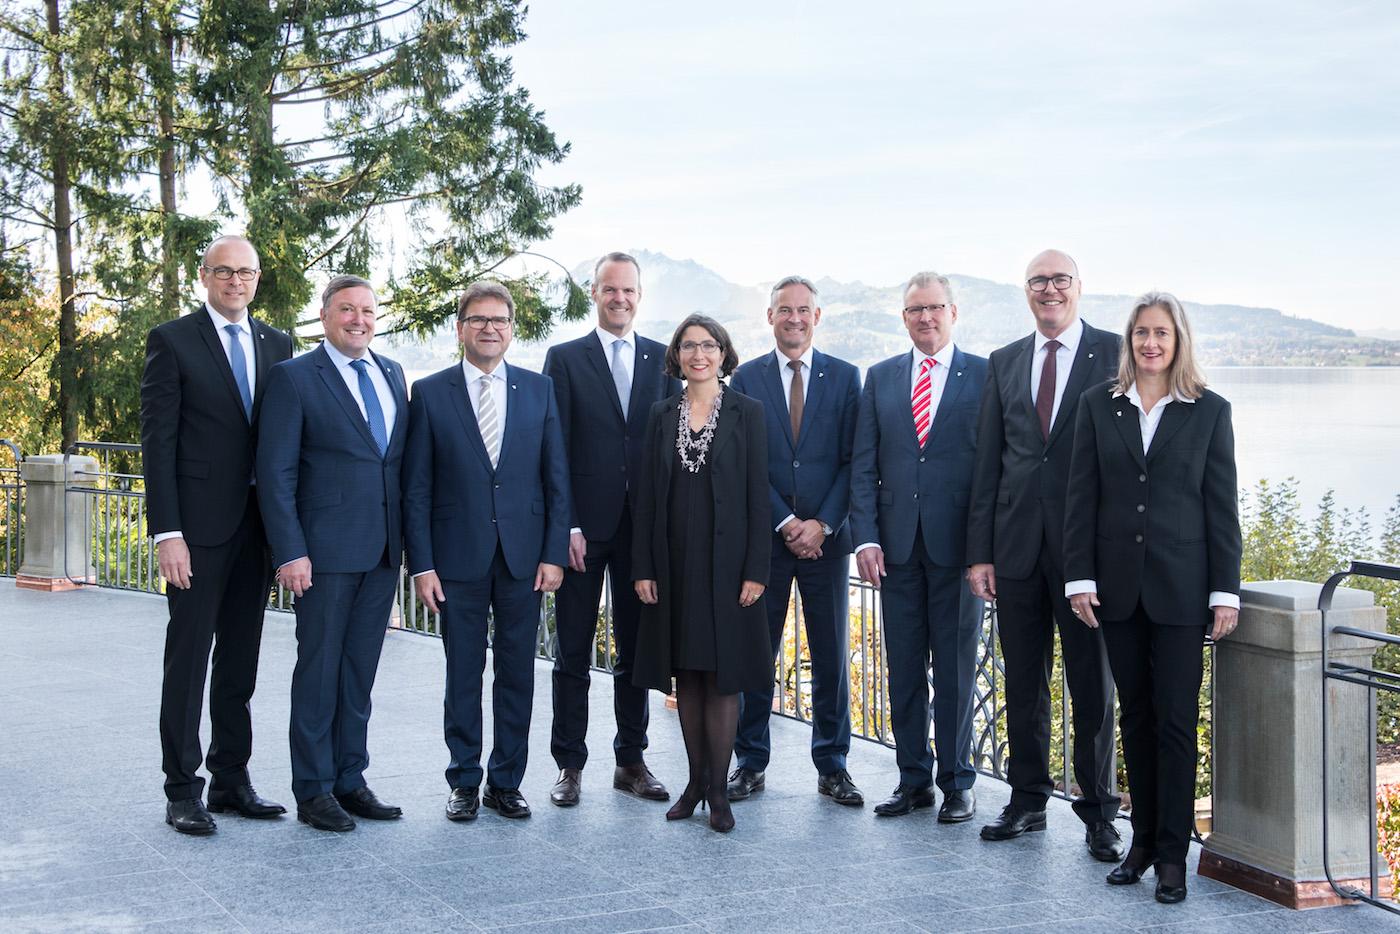 Von links nach rechts: Tobias Moser, Urs Hürlimann, Beat Villiger, Stephan Schleiss, Manuela Weichelt-Picard, Matthias Michel,Heinz Tännler, Martin Pfister, Renée Spillmann Siegwart.